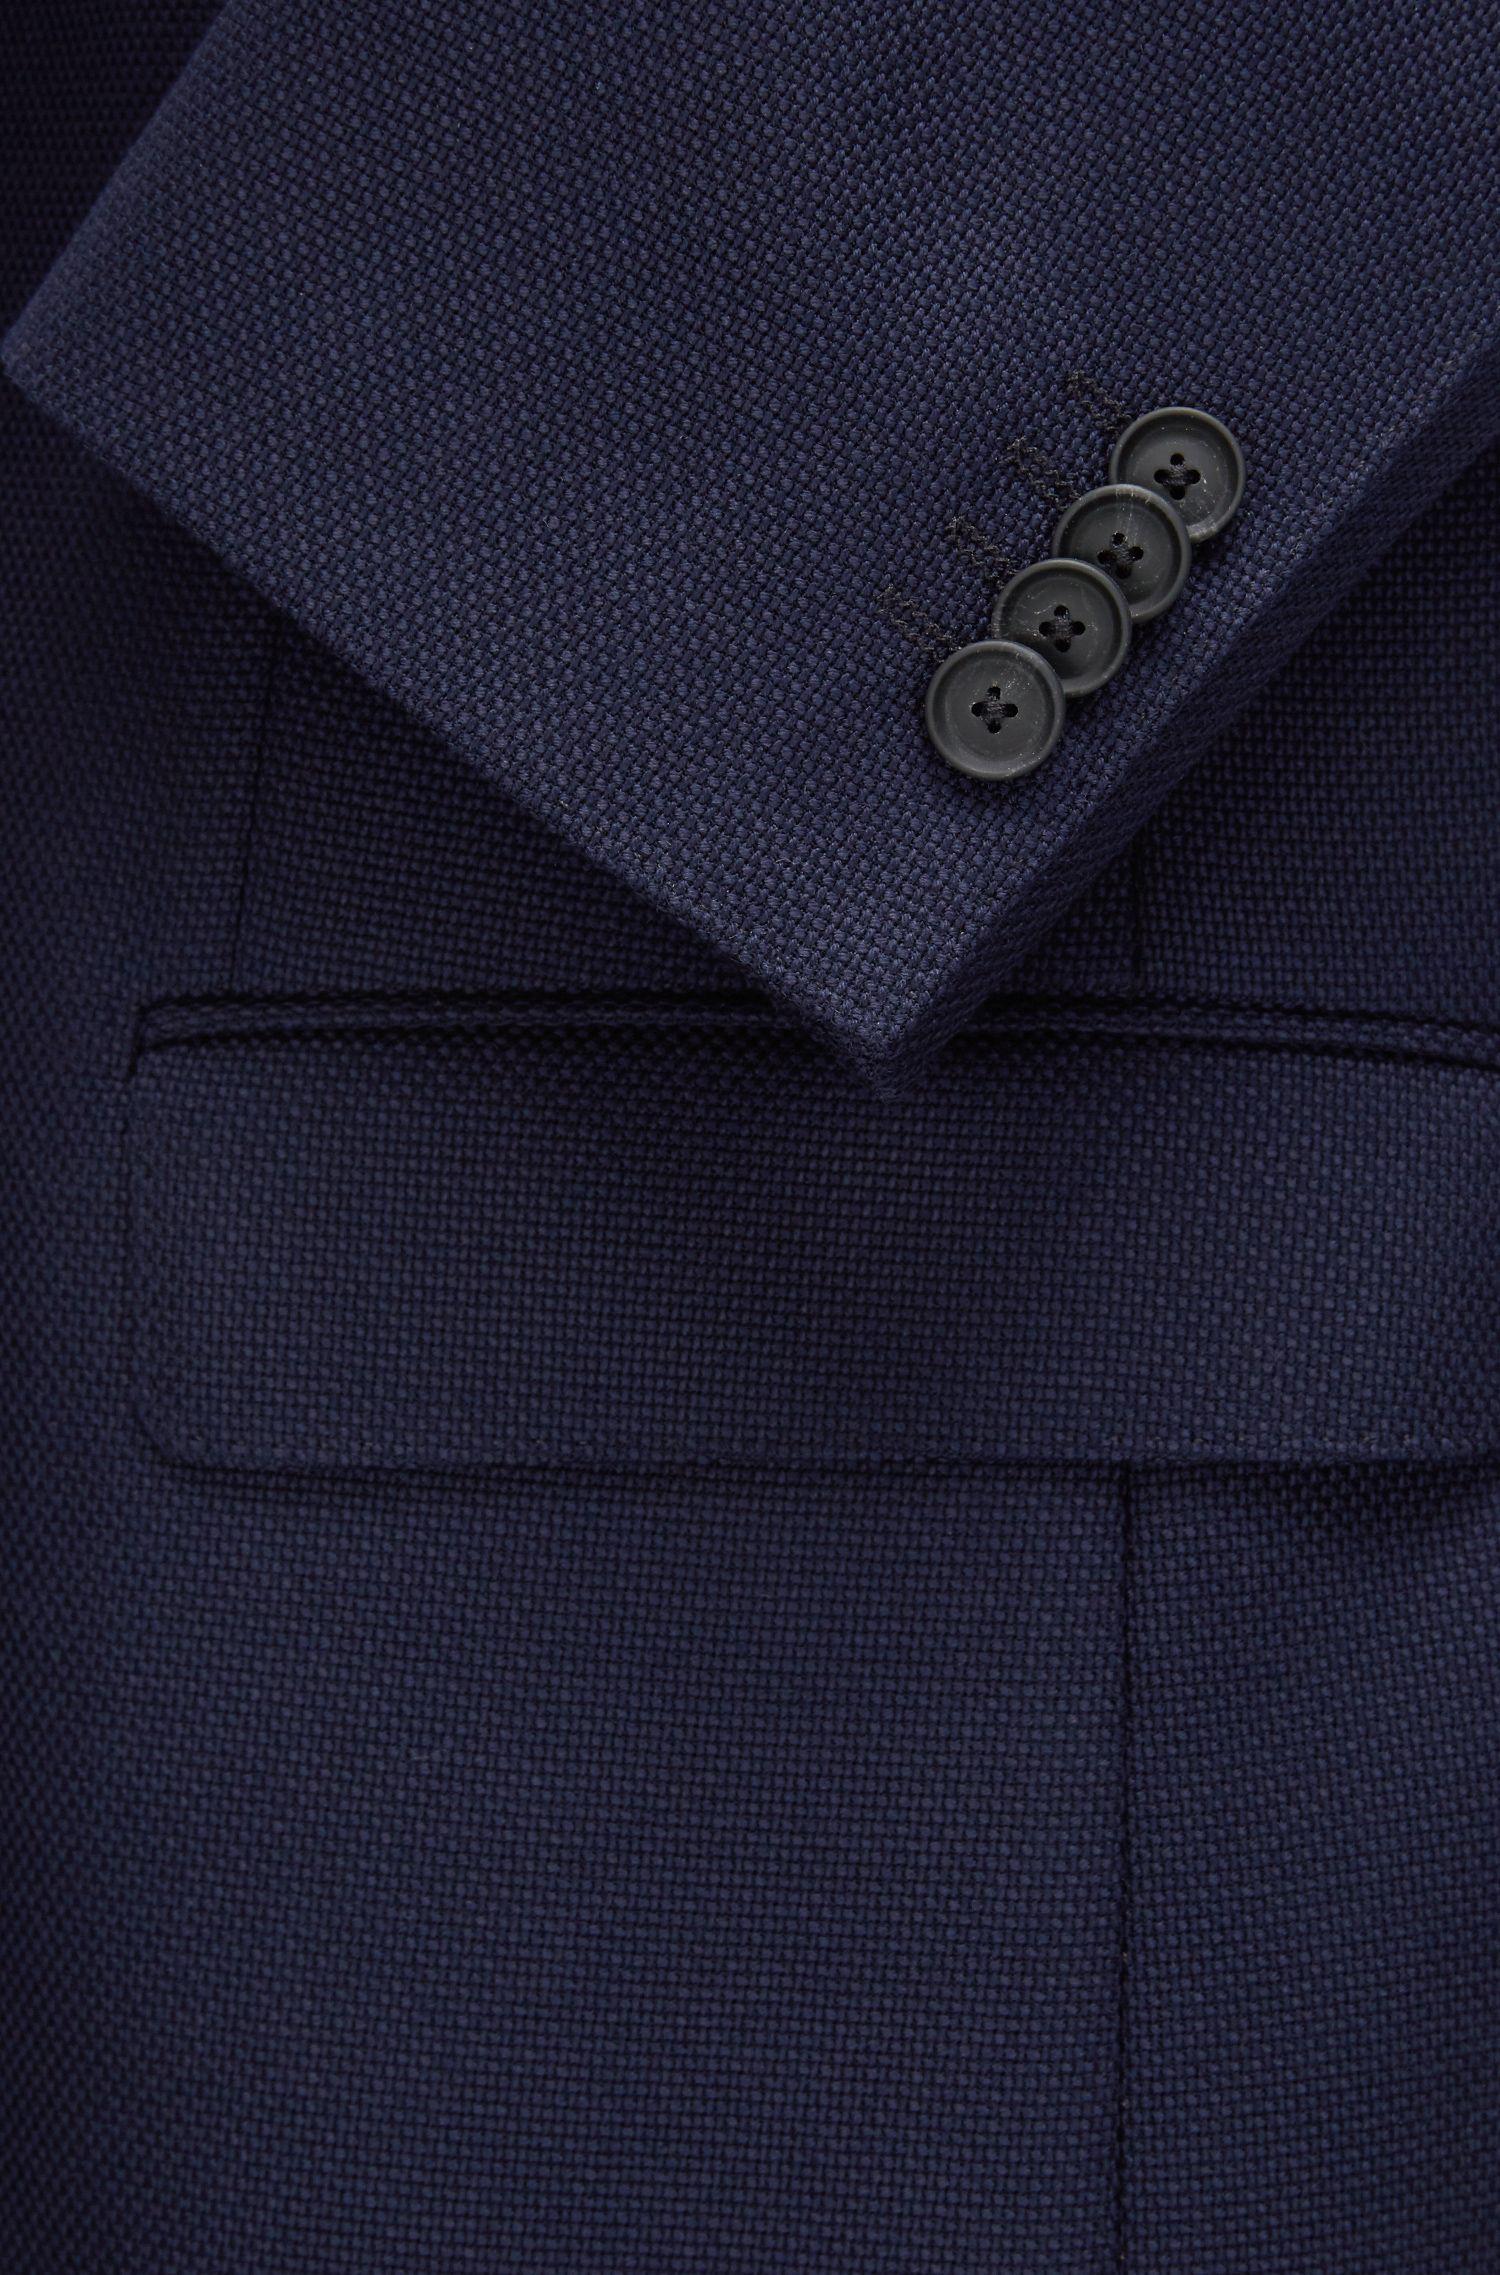 Stretch Virgin Wool Travel Sport Coat, Regular Fit | Jet, Dark Blue